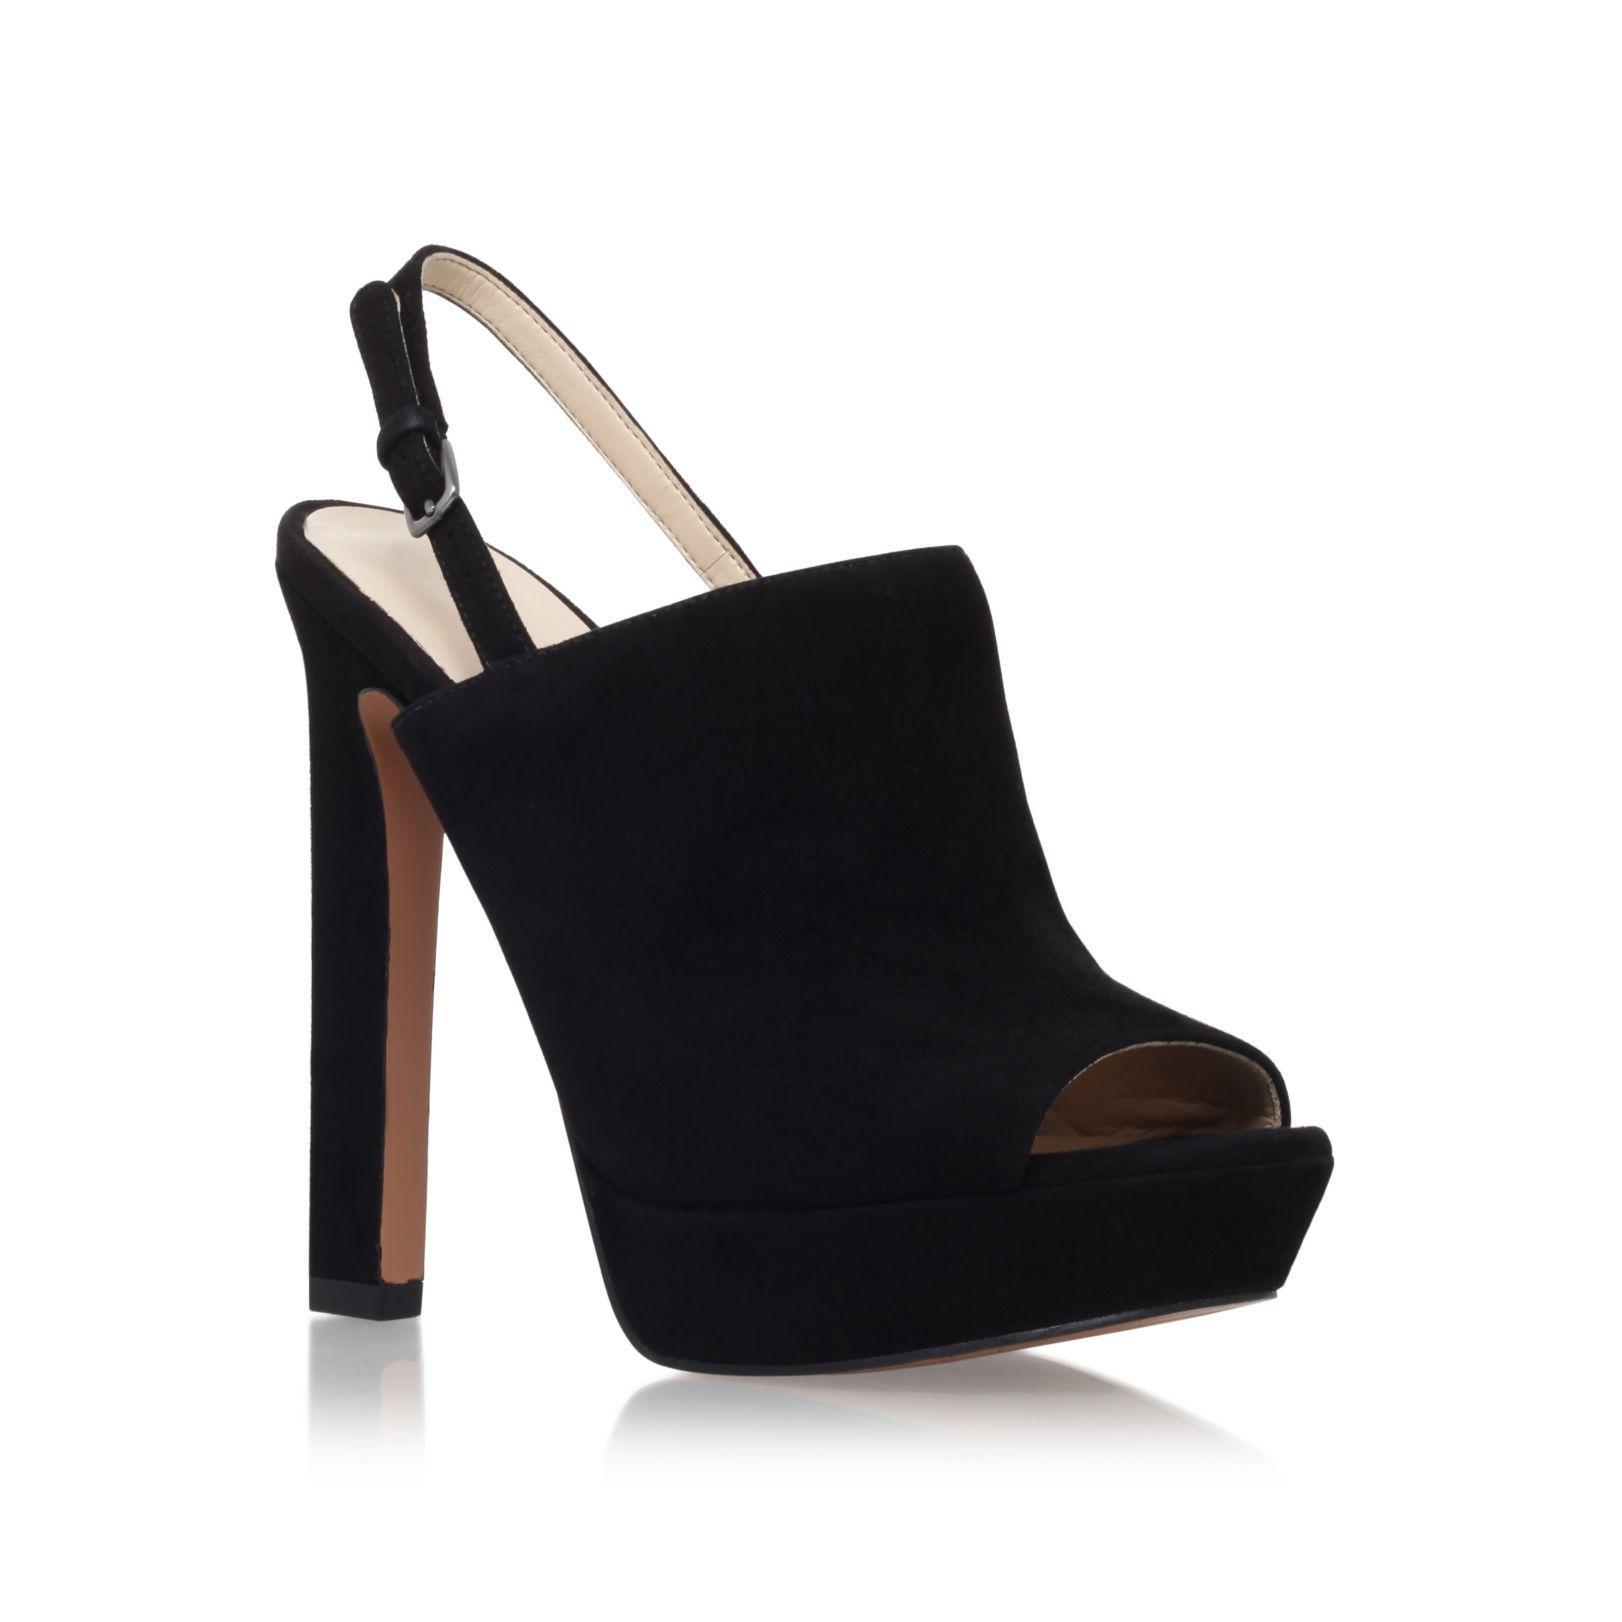 Nine West Women S Pointed Toe Slingback Pumps Shoes